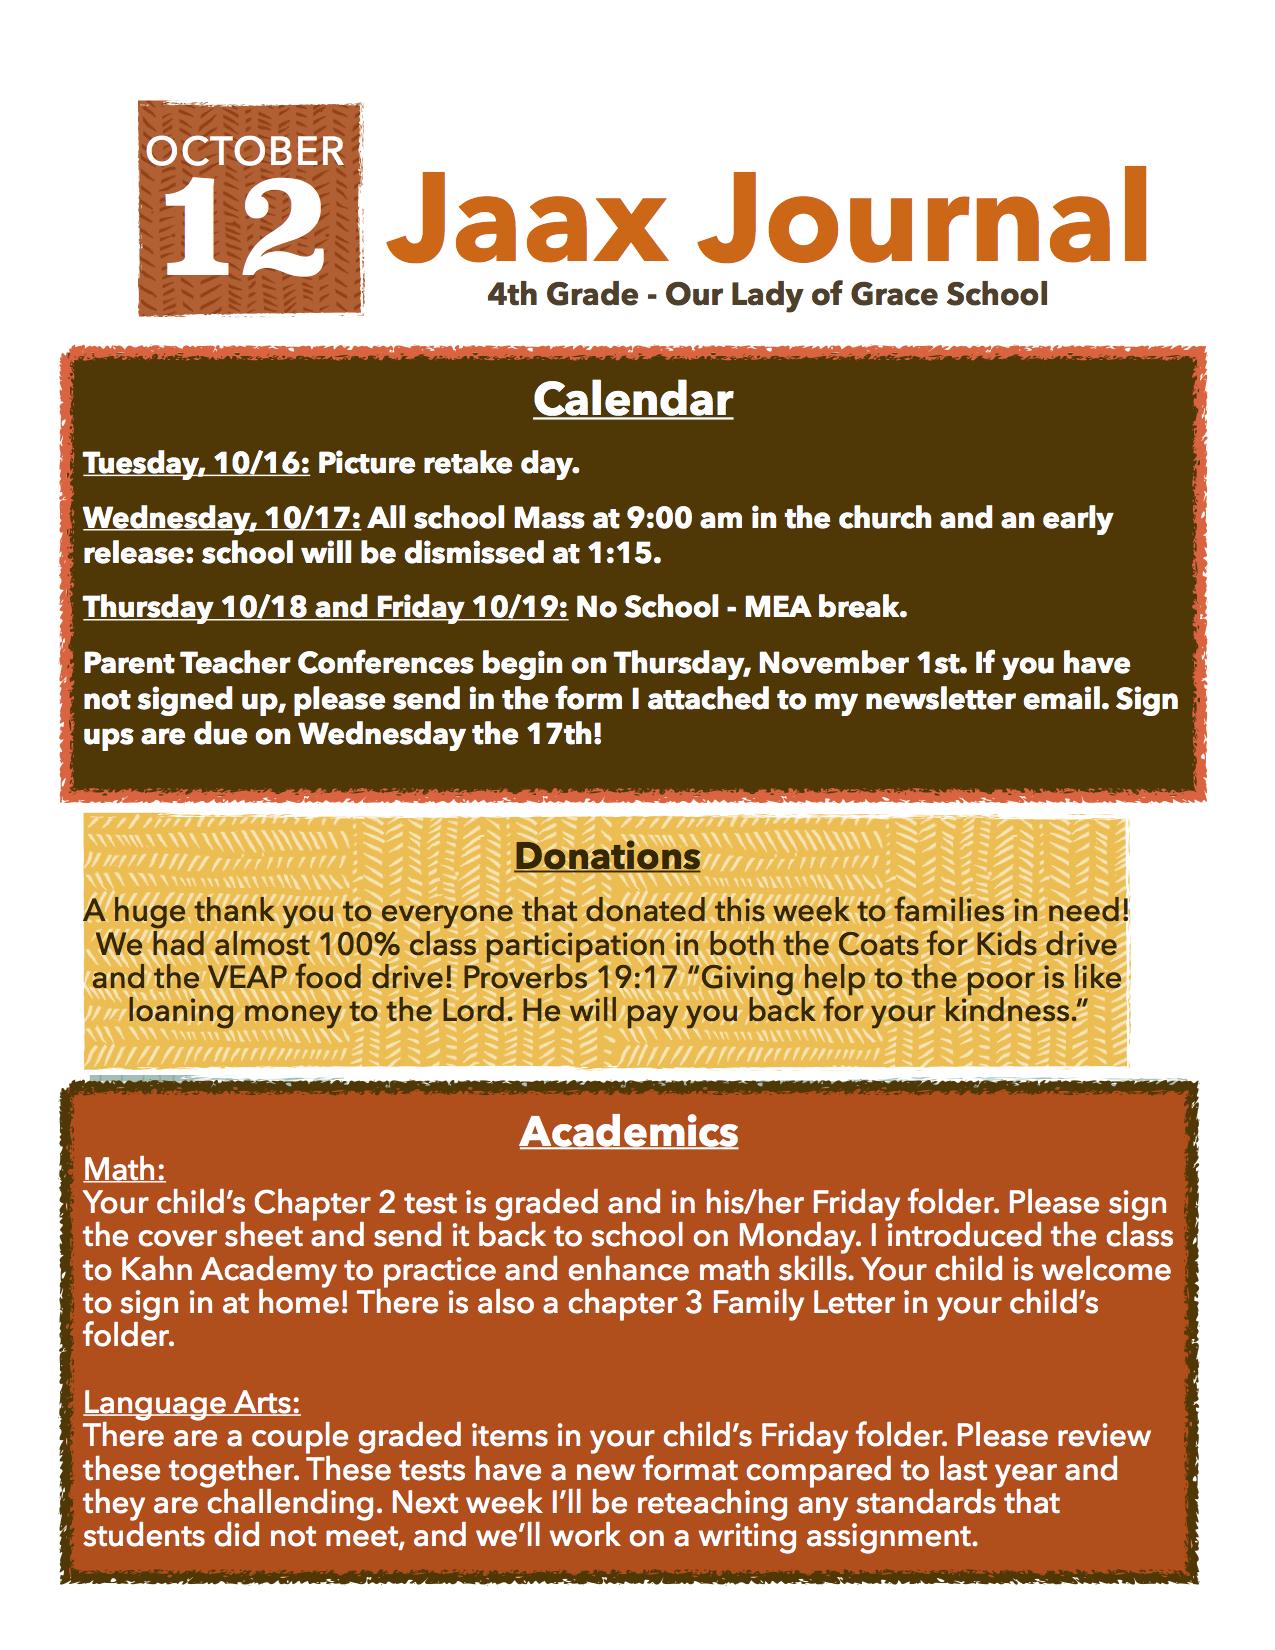 JaaxJournal10-12-18.jpg